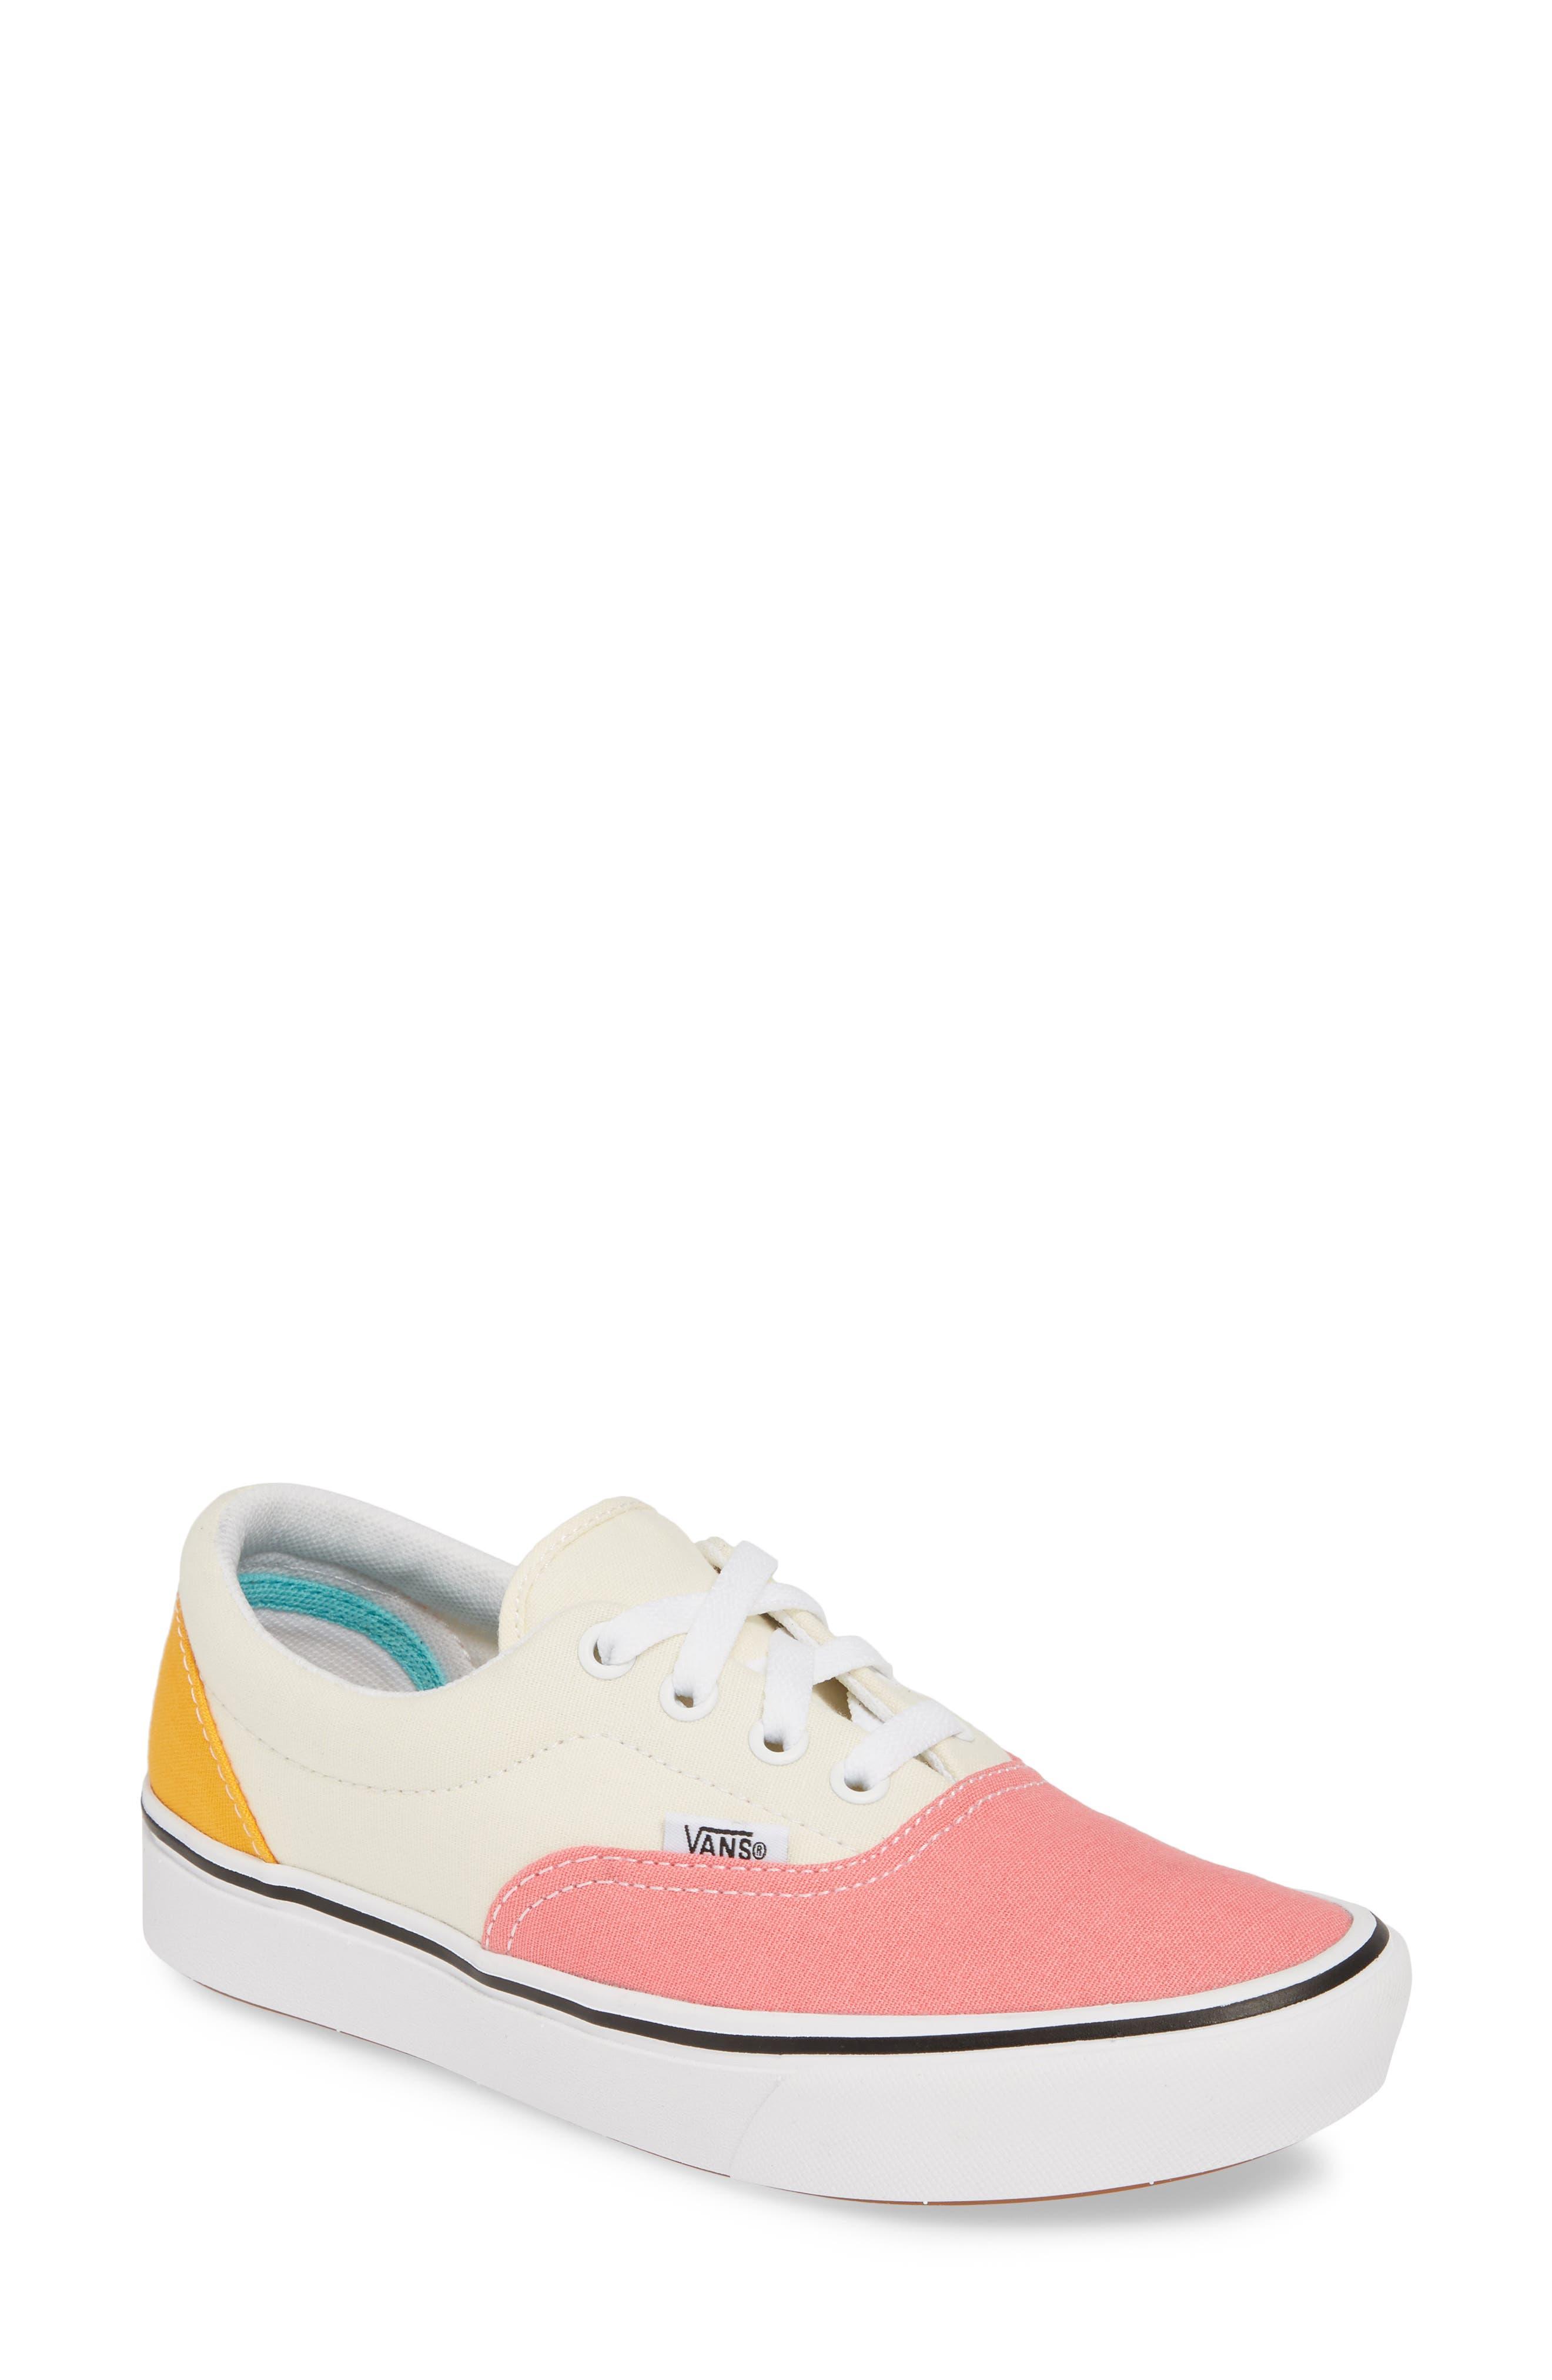 Vans Comfycush Era Colorblock Sneaker- Ivory